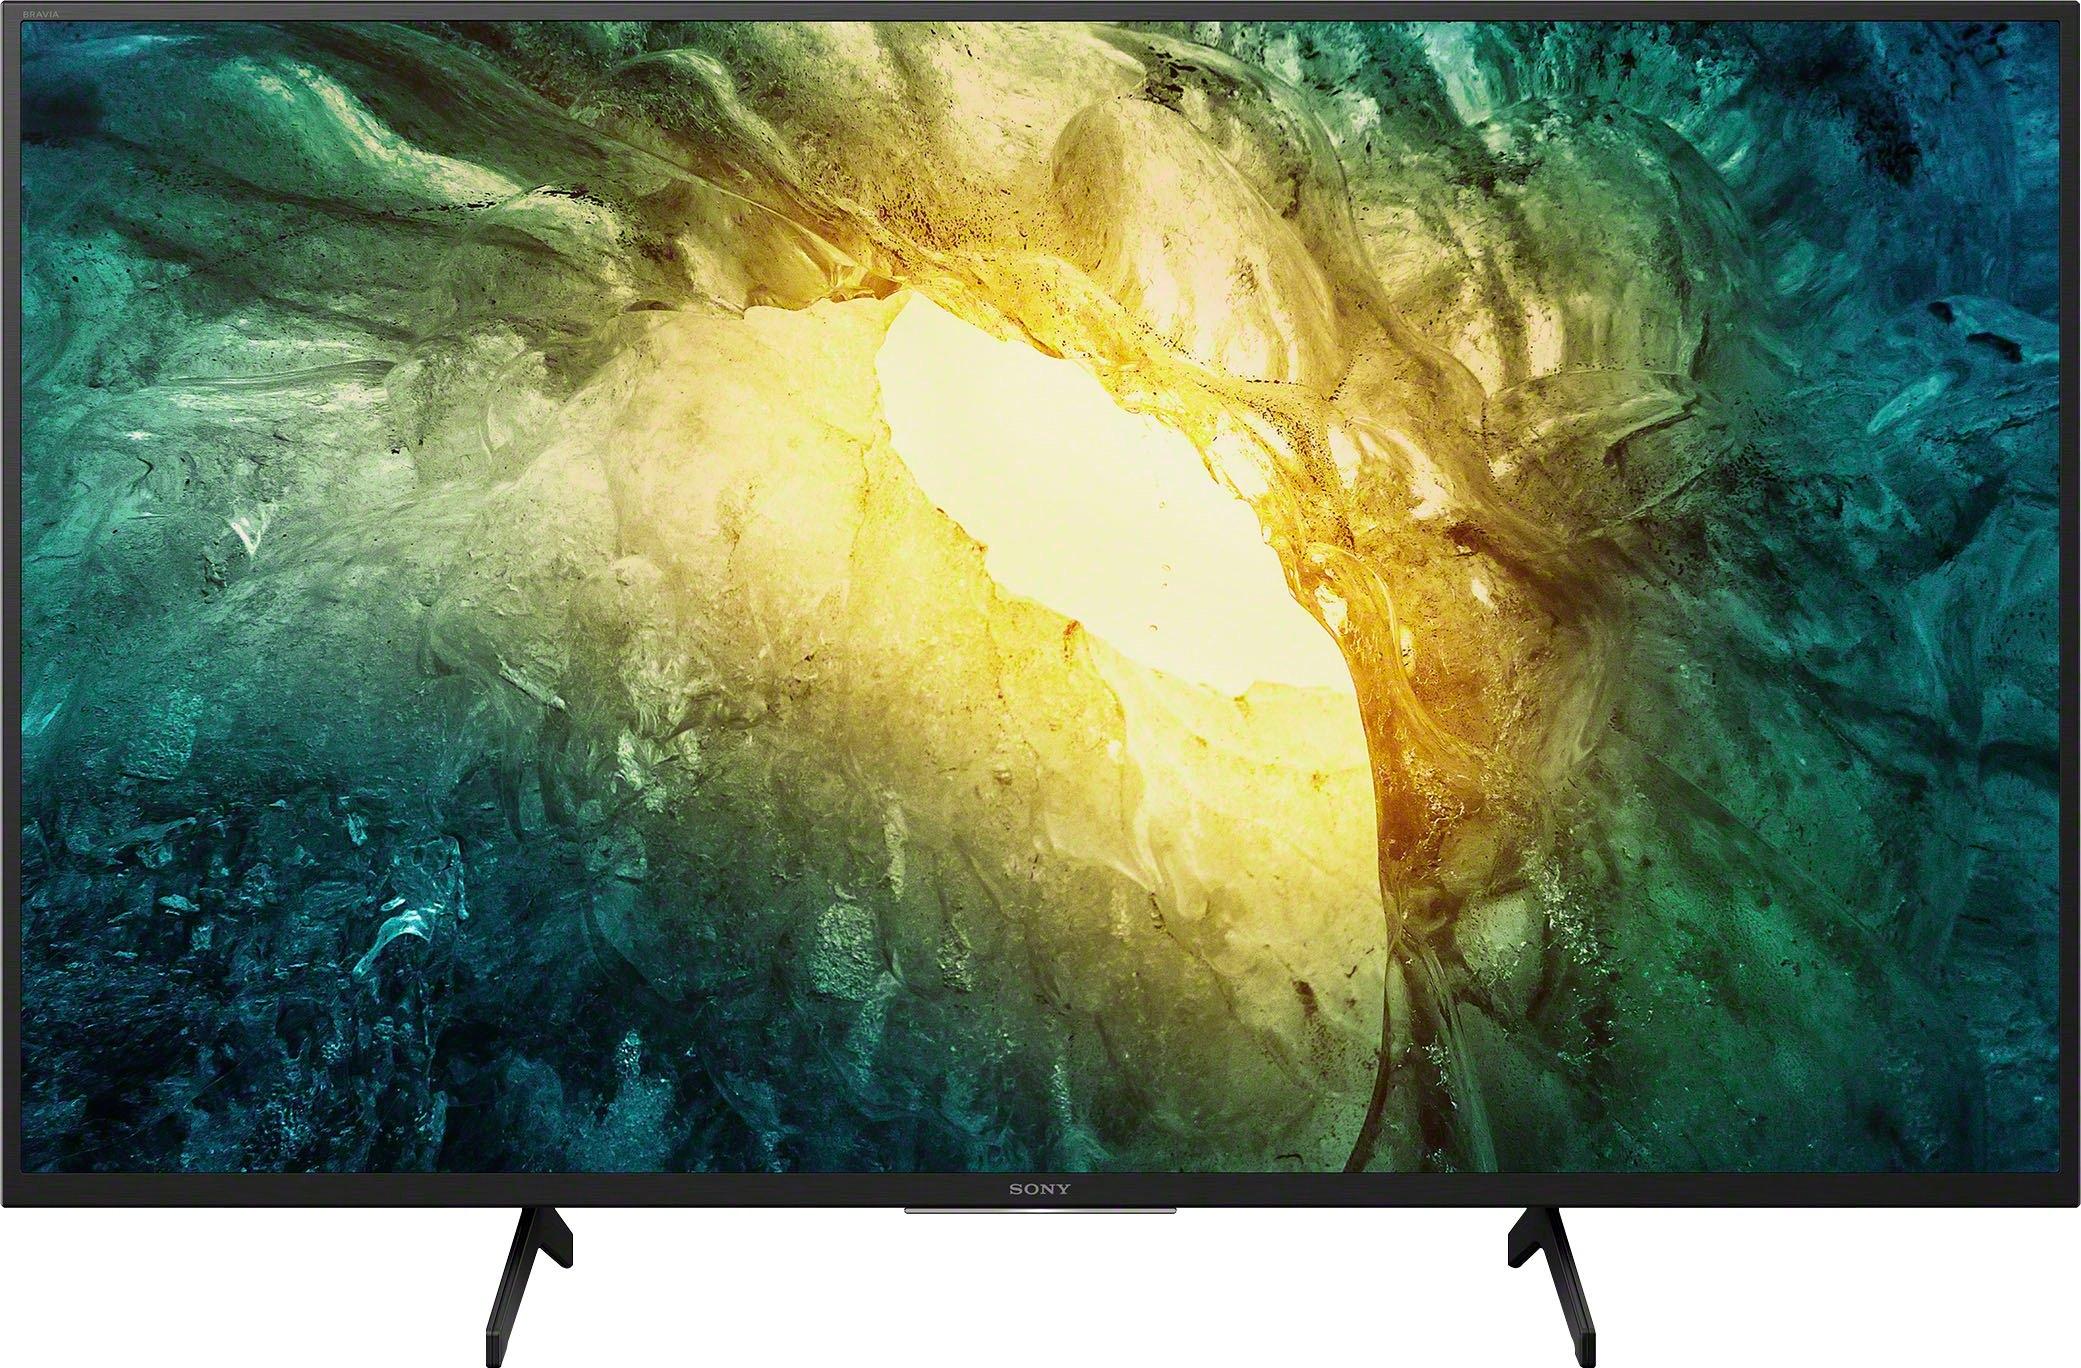 Sony LED-TV KD-43X7055 Bravia, 108 cm / 43